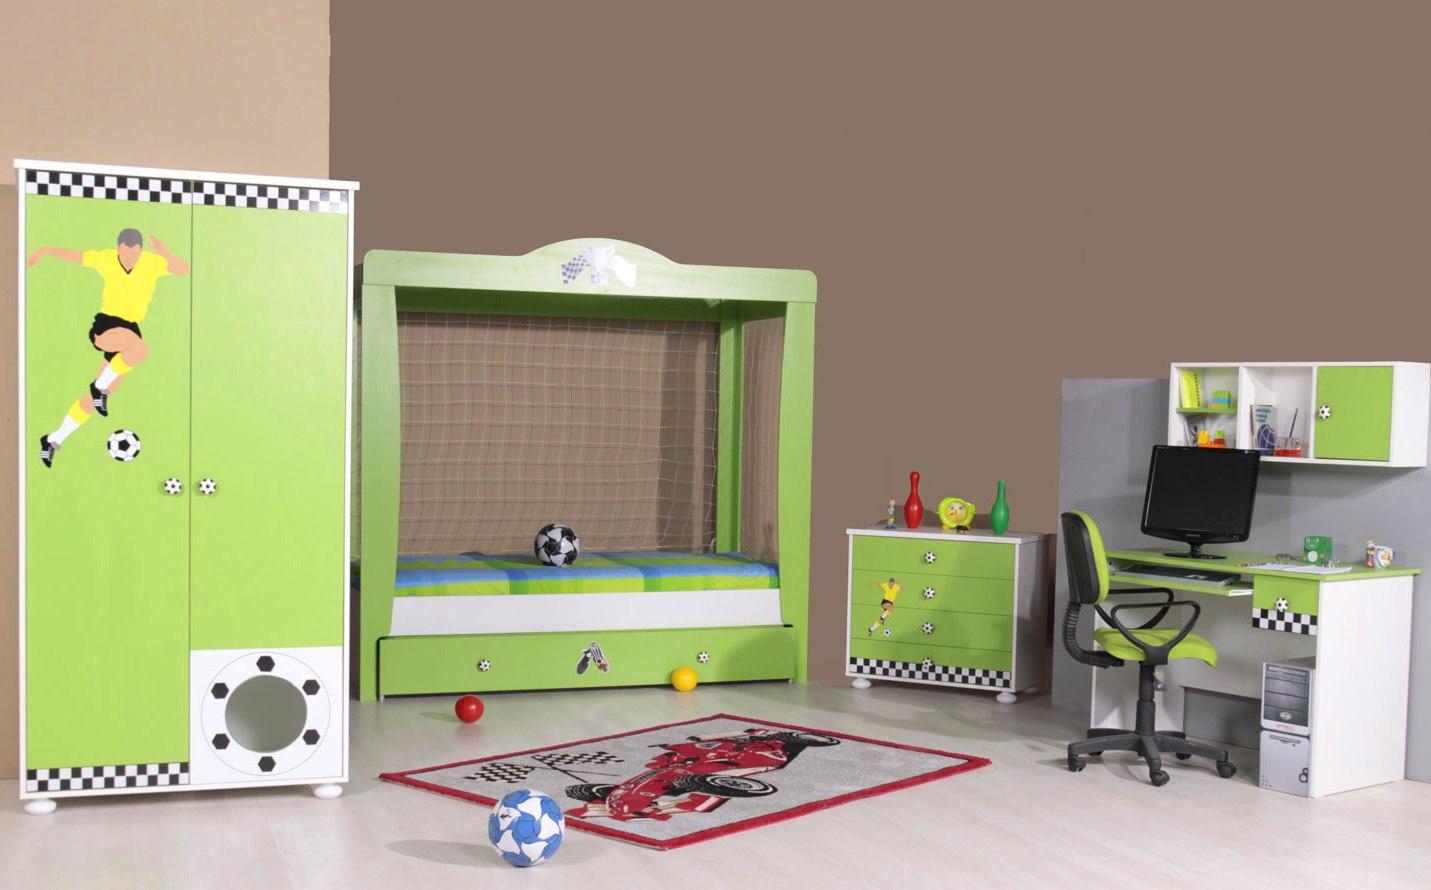 Voetbal Slaapkamer Accessoires : Voetbal slaapkamer voetbal slaapkamer ikea beste inspiratie voor